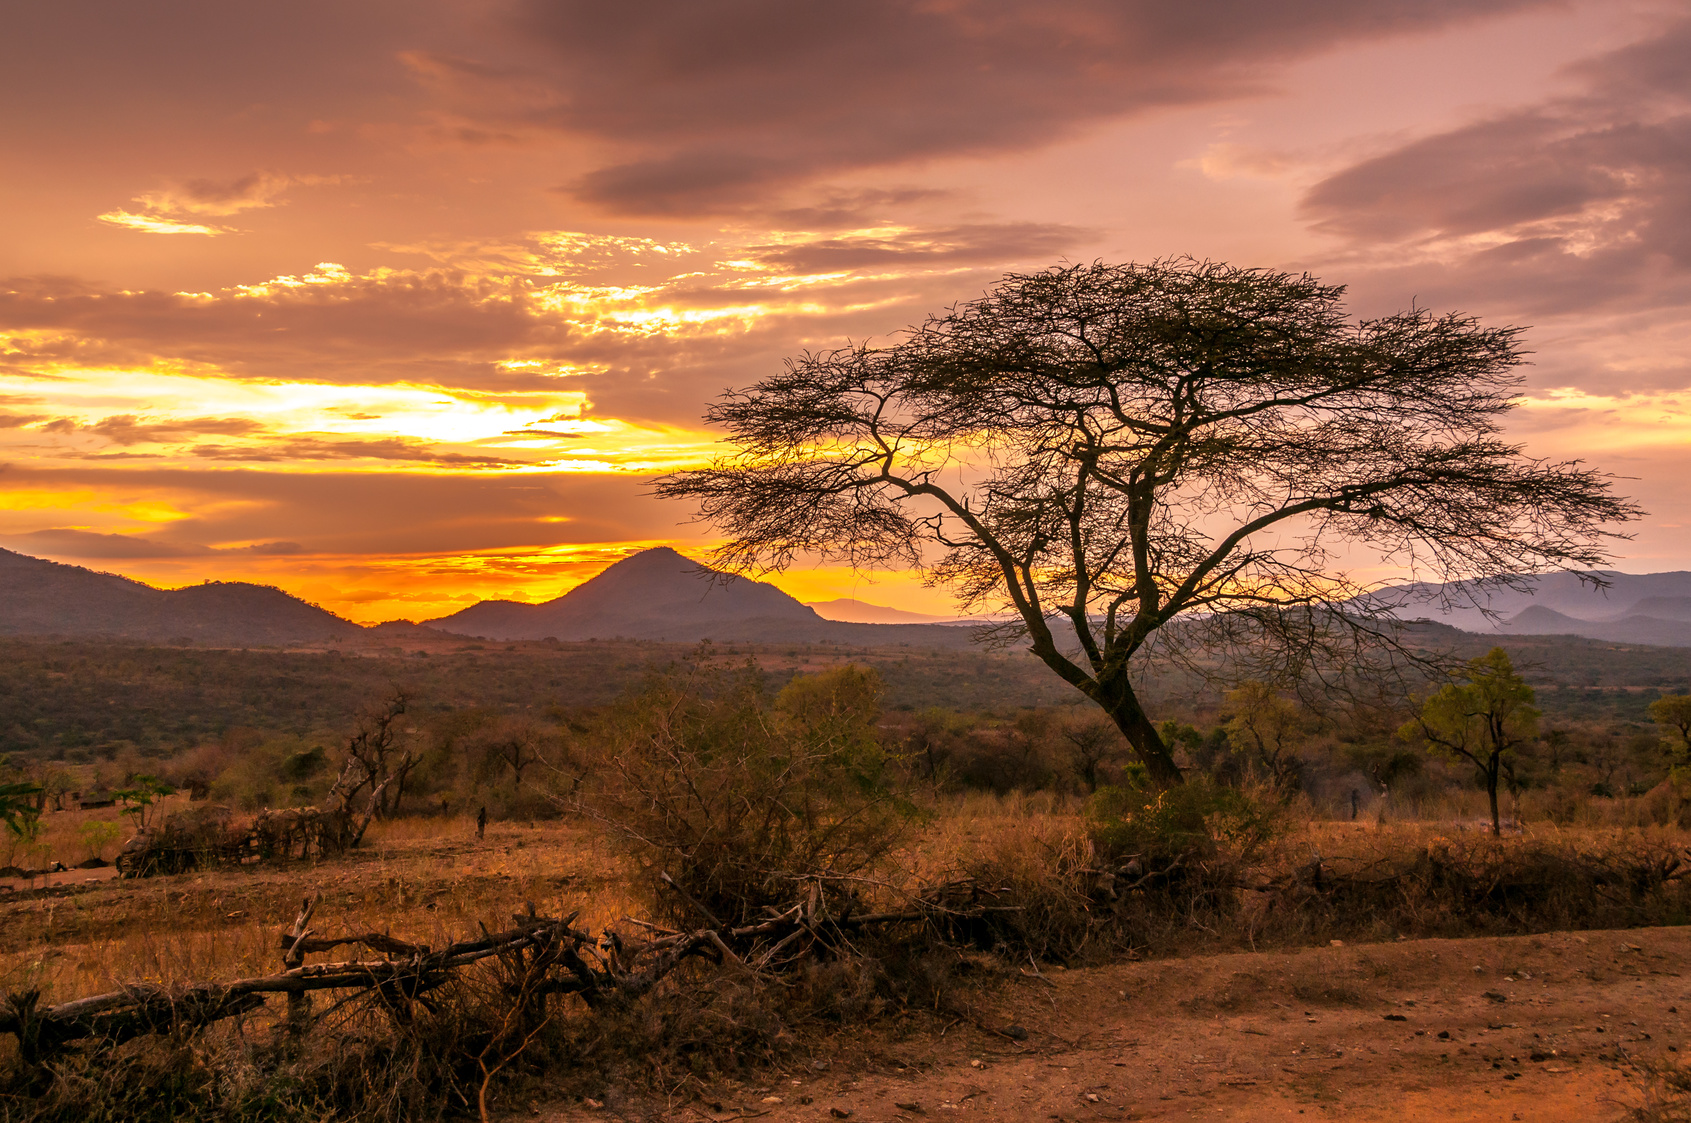 Riccardo Spatolisano: Viaggio fotografico in Dacalia – Etiopia dal 20-01-2018 al 29-01-2018